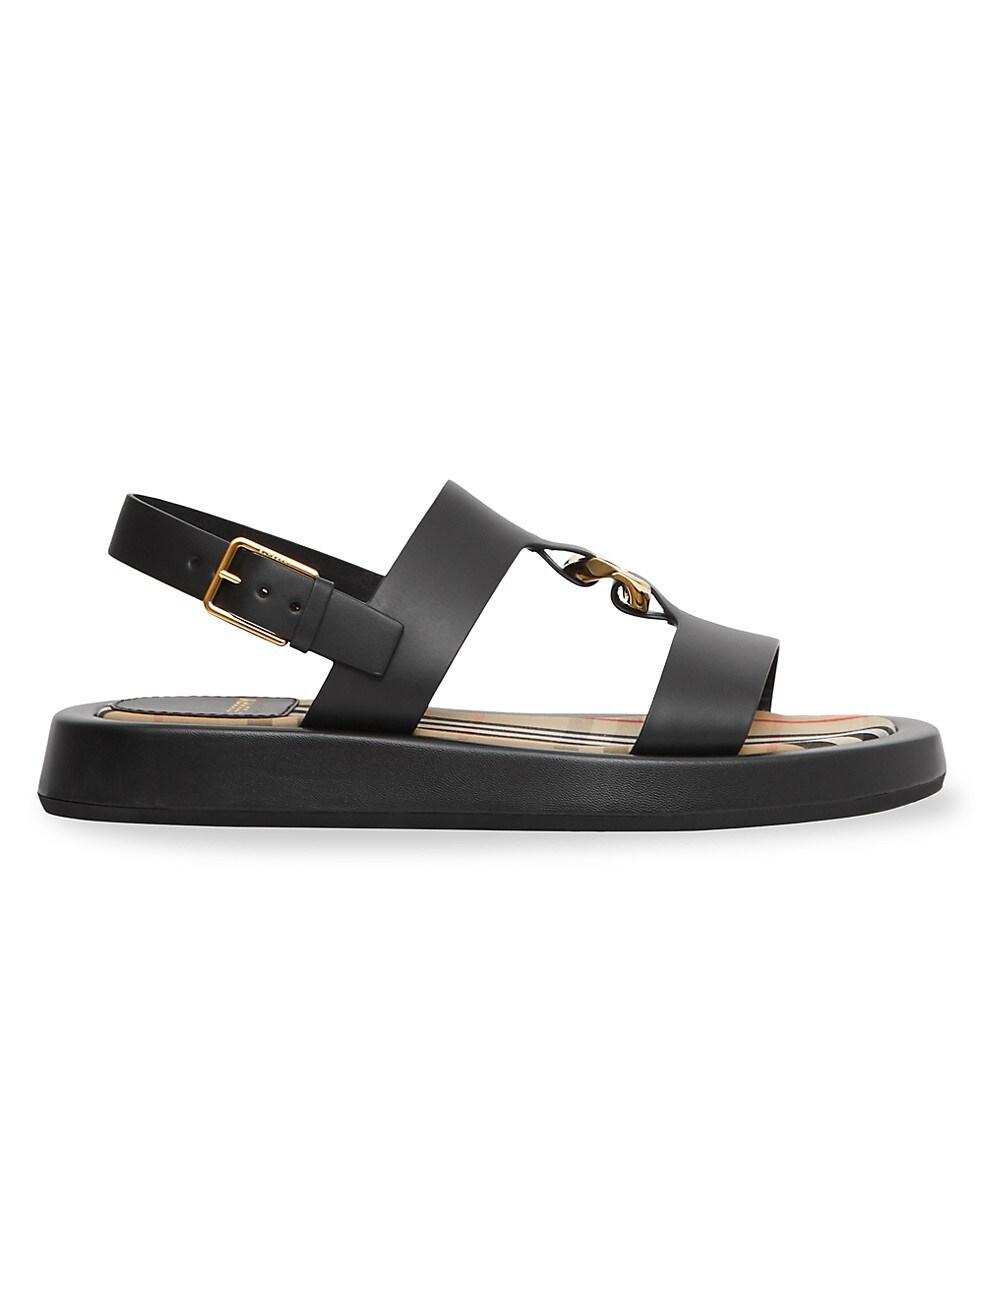 Burberry Buckingham Leather Slingback Sandals